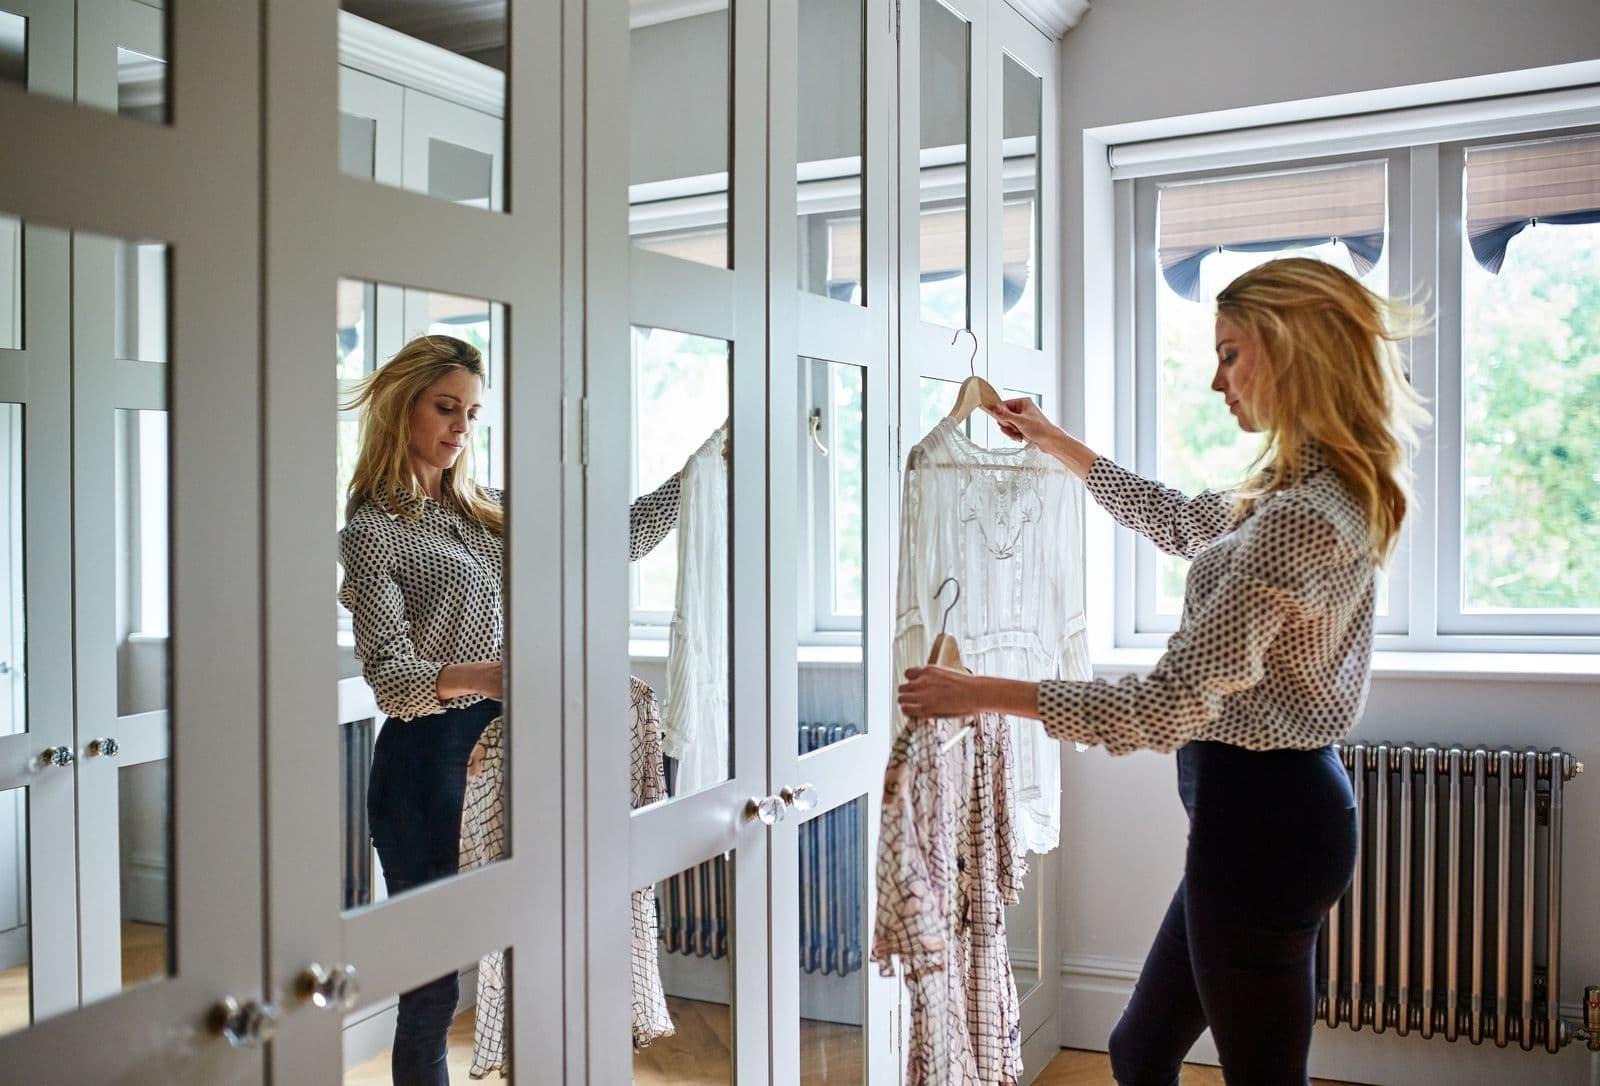 Woman choosing an outfit